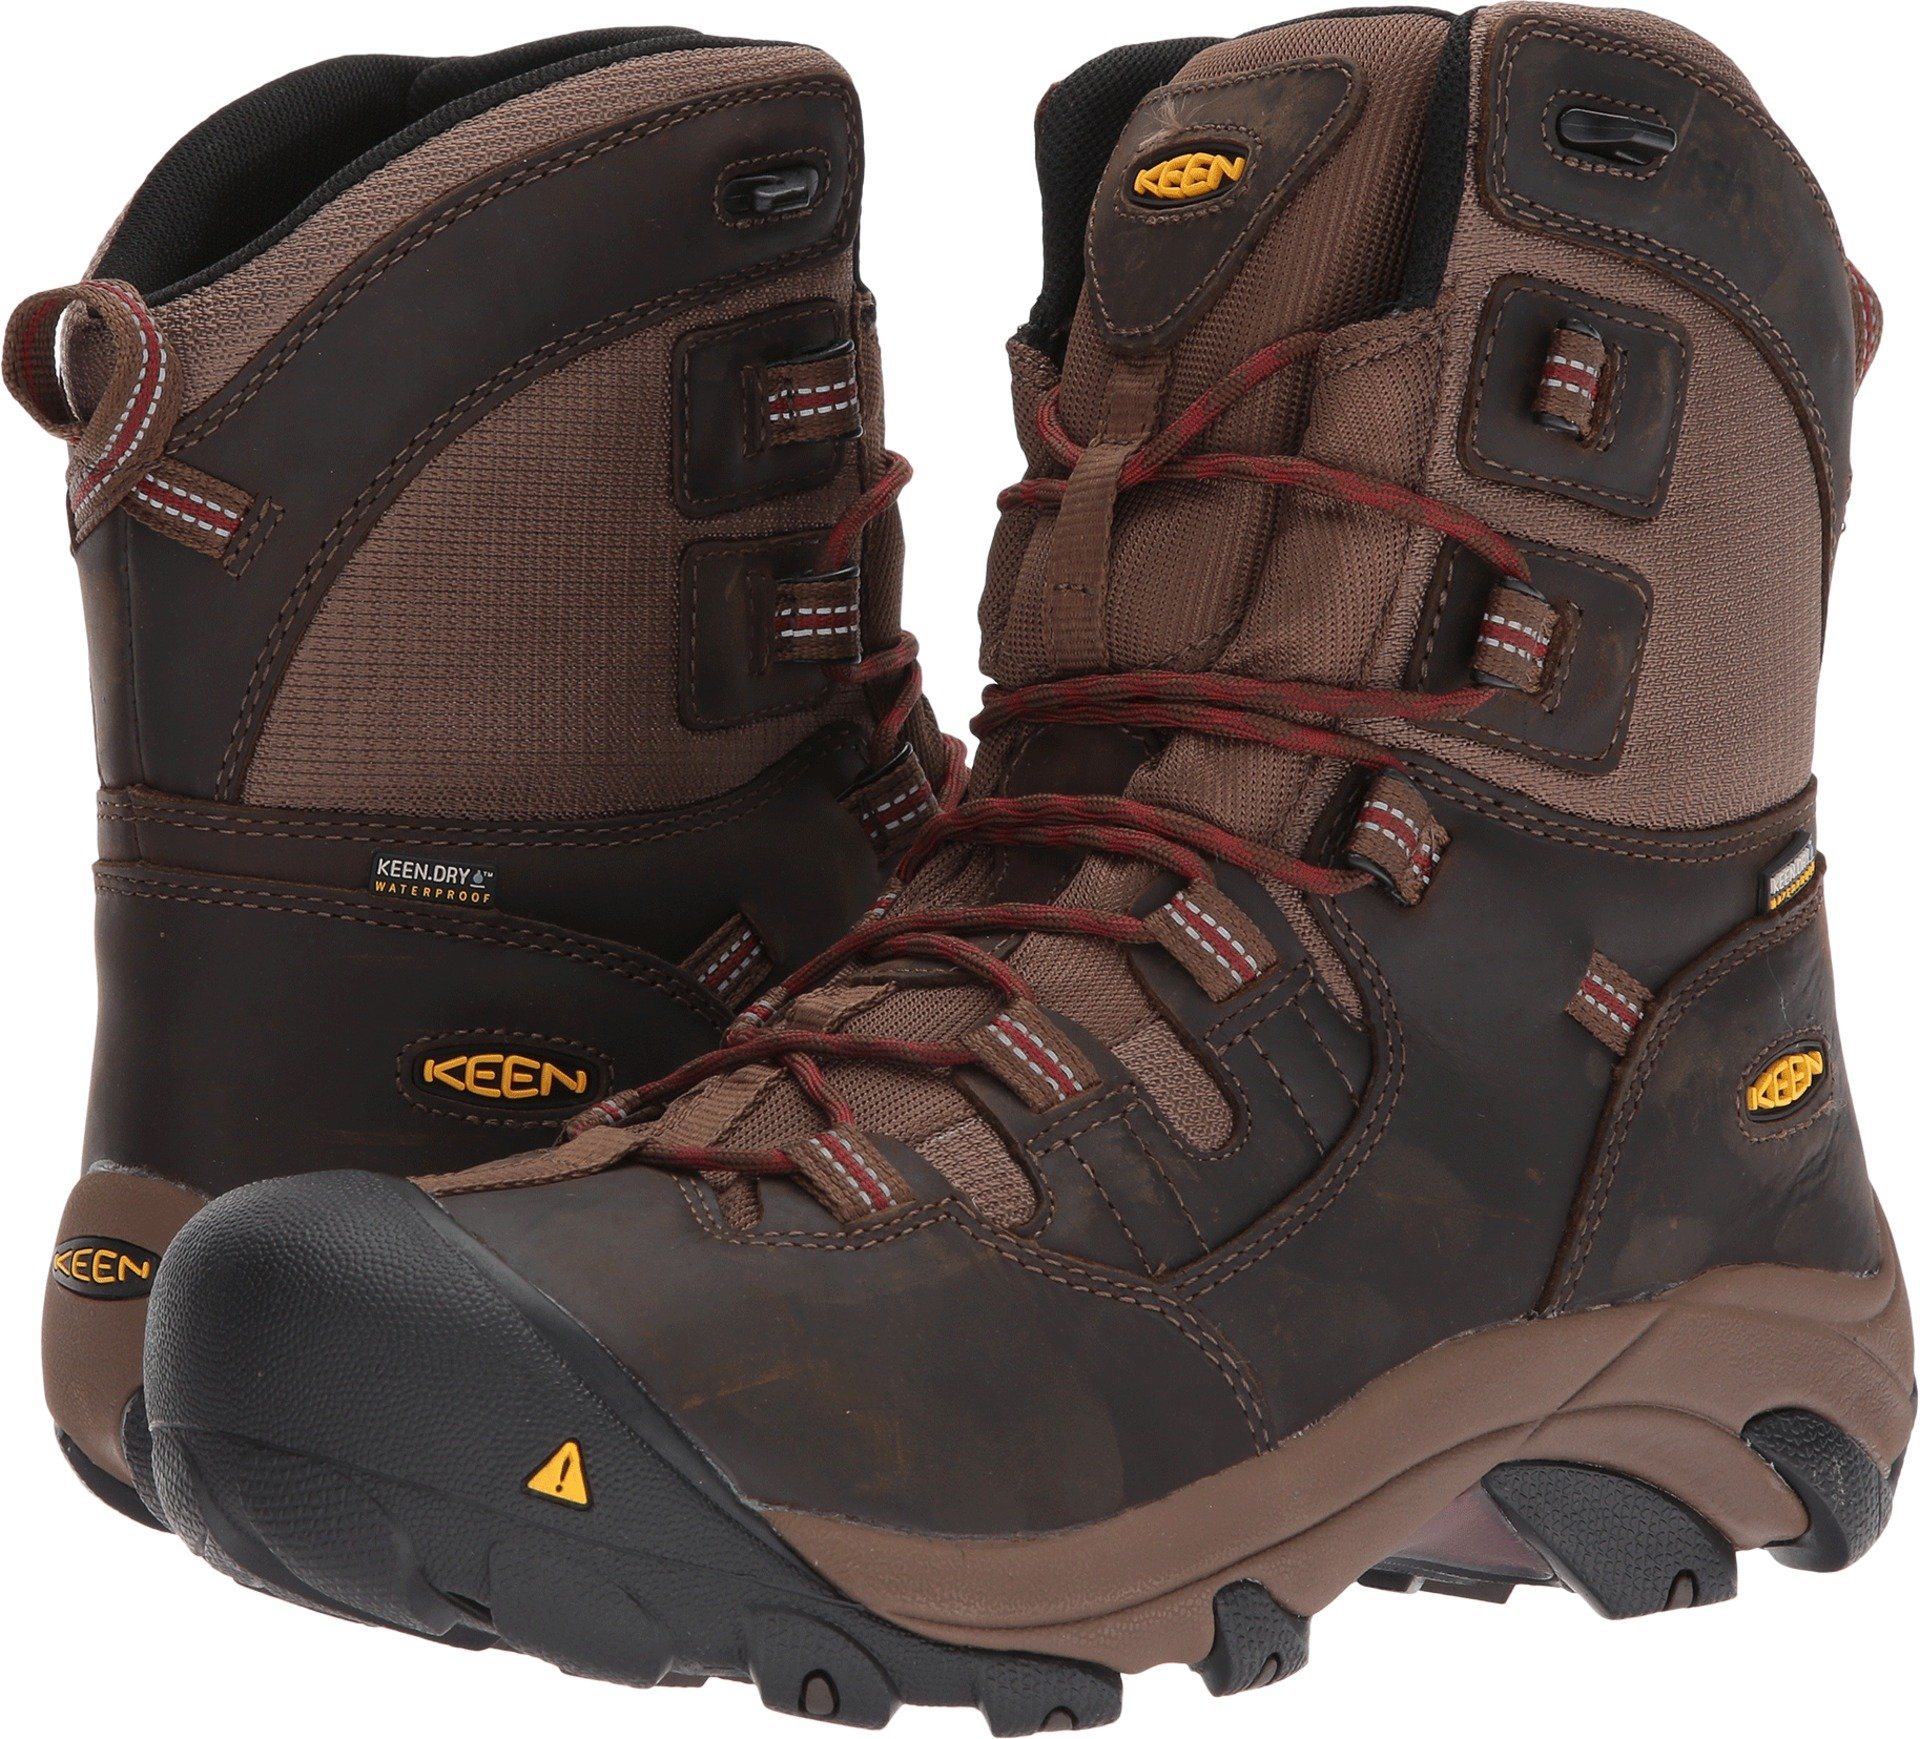 KEEN Utility Men's Detroit 8'' Soft Toe Waterproof Industrial and Construction Shoe, Dark Earth/Burnt Henna, 10.5 D US